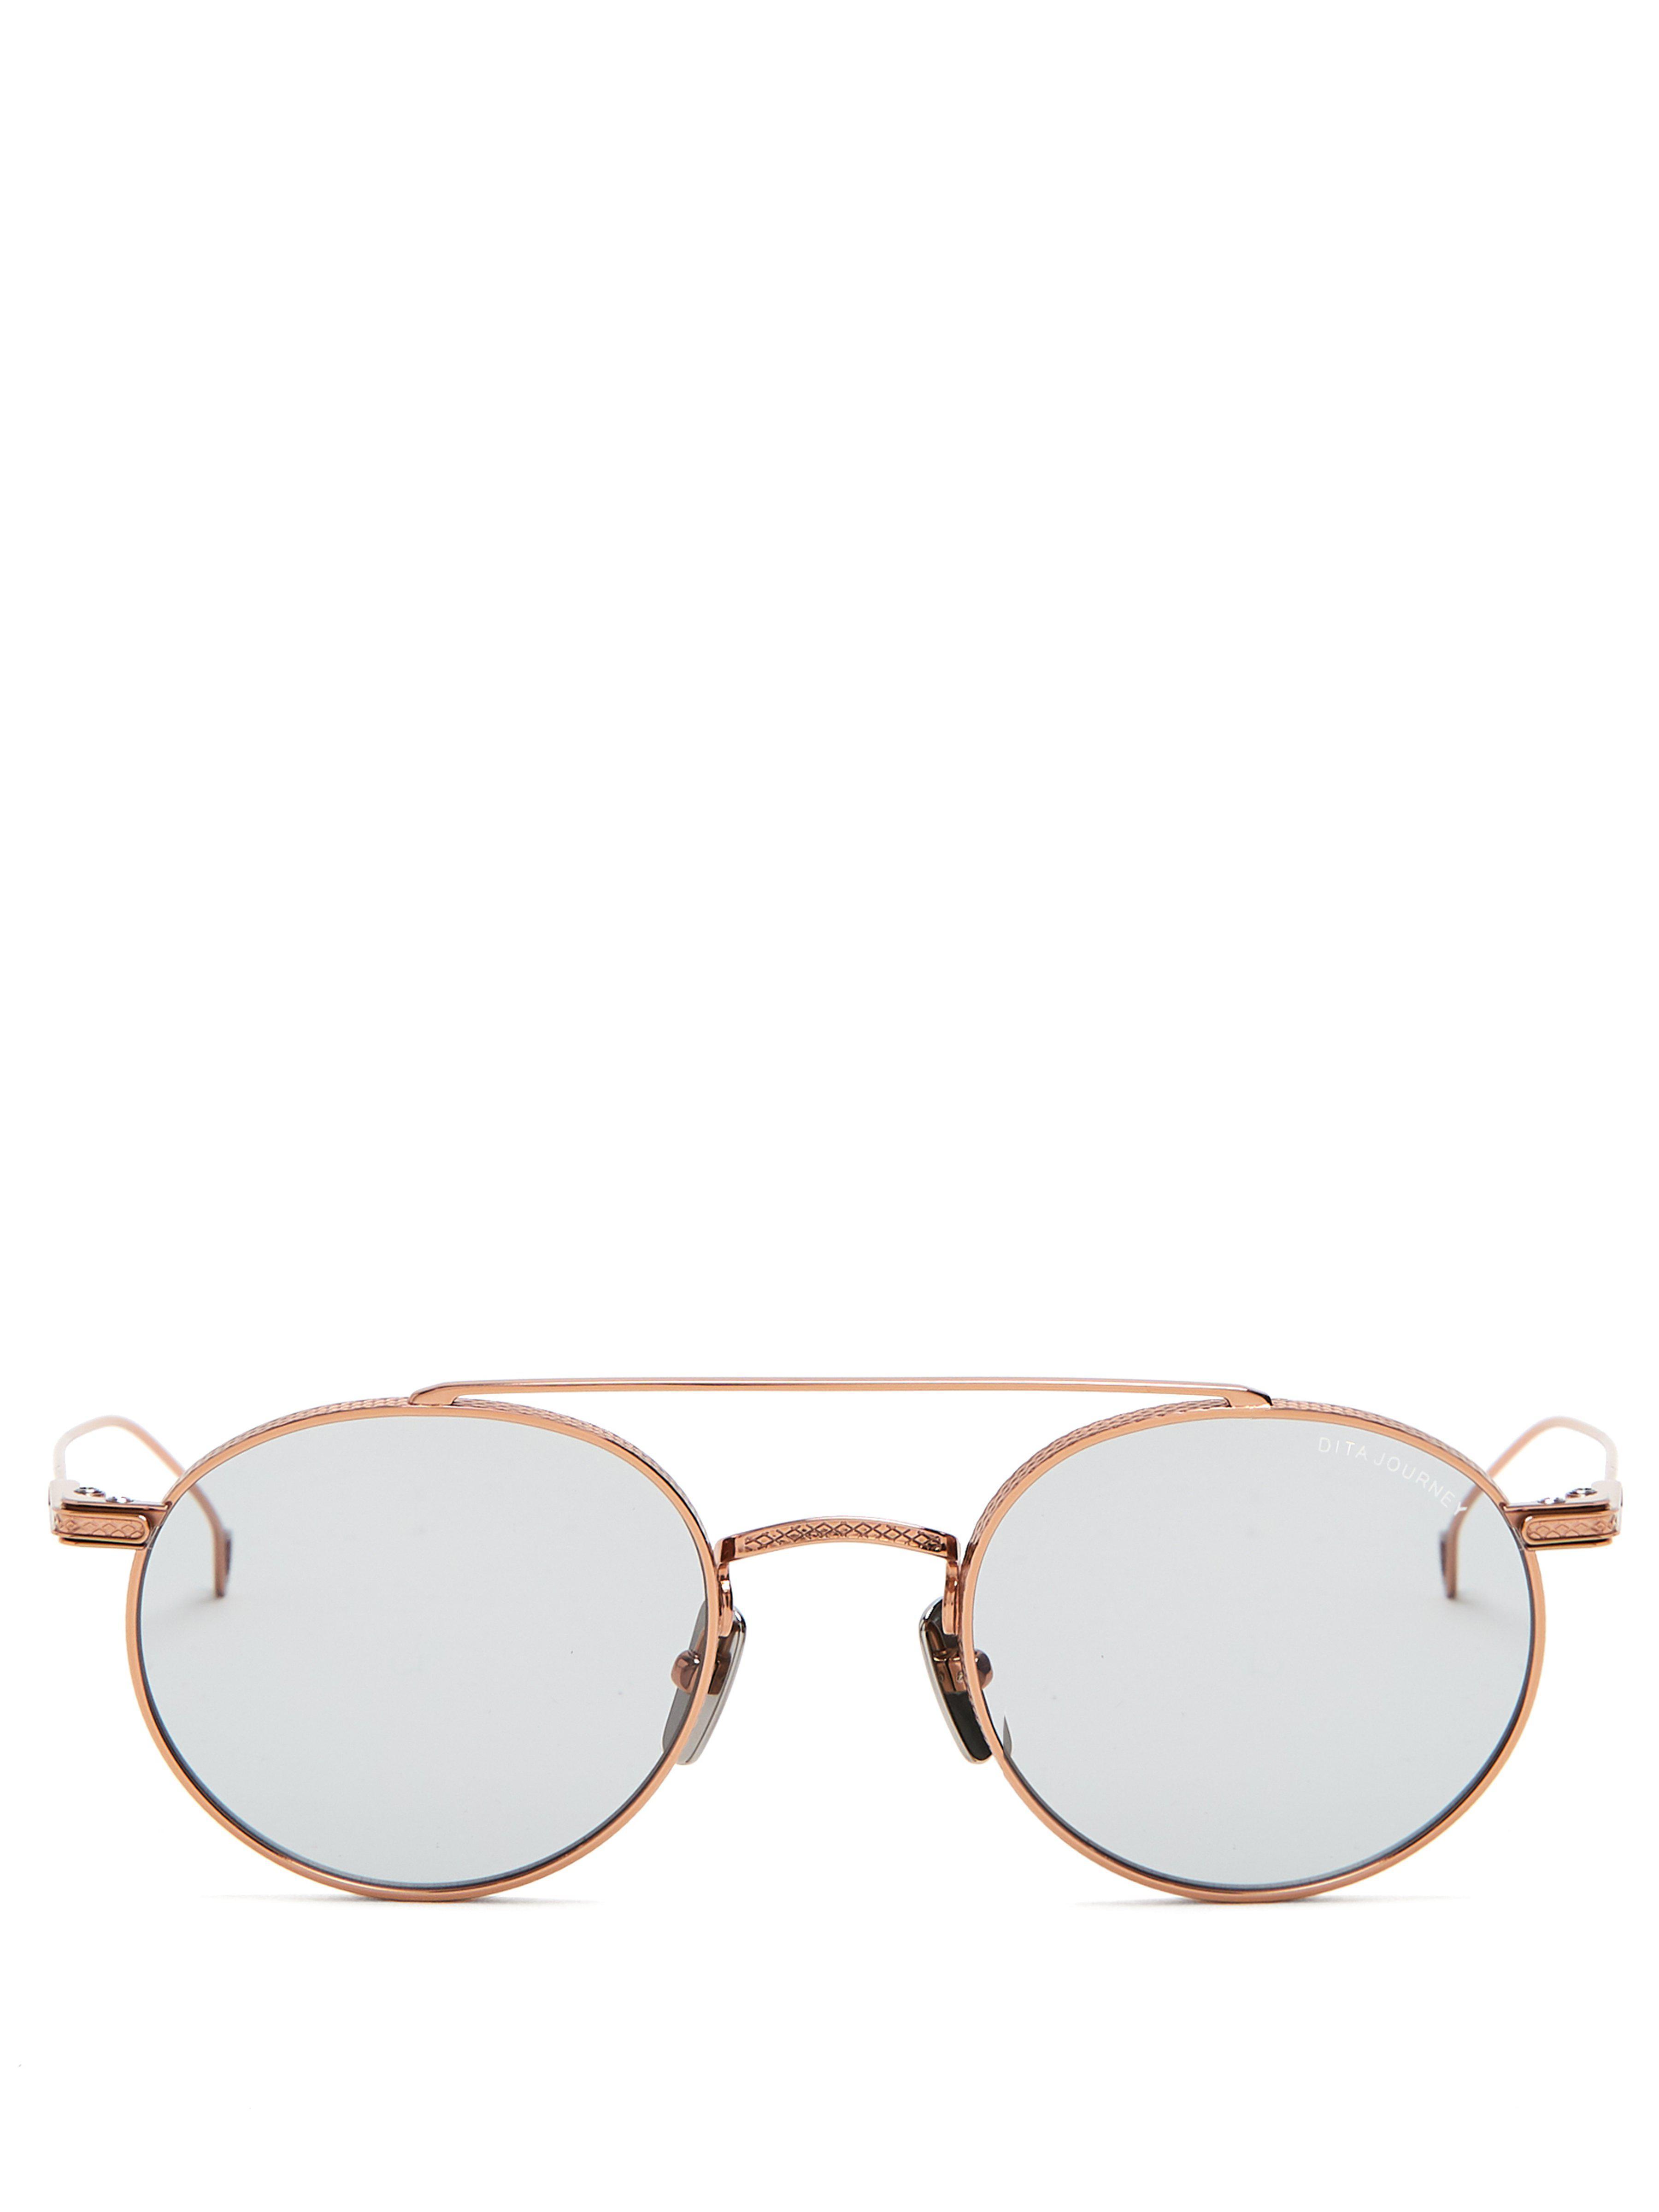 701d3277390 Dita Eyewear Journey Round Frame Sunglasses in Metallic for Men - Lyst